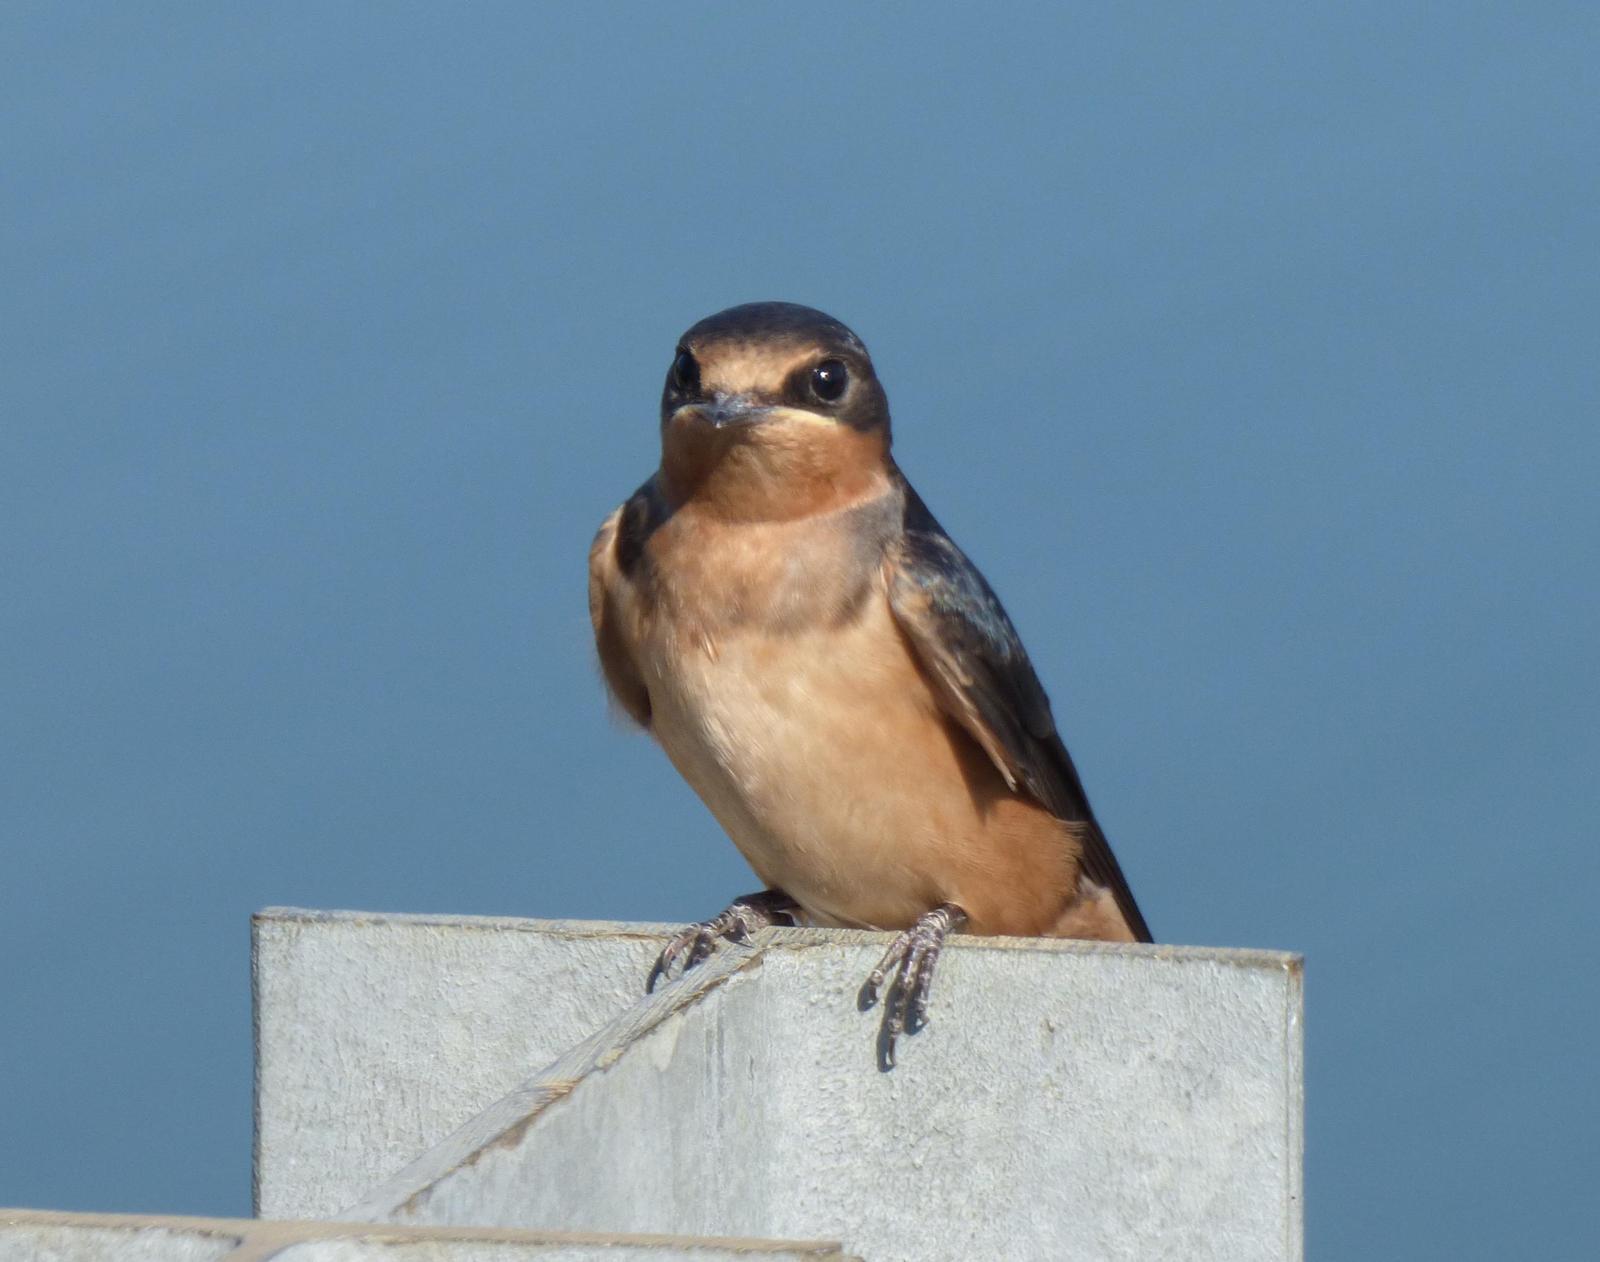 Barn Swallow Photo by Phil Ryan